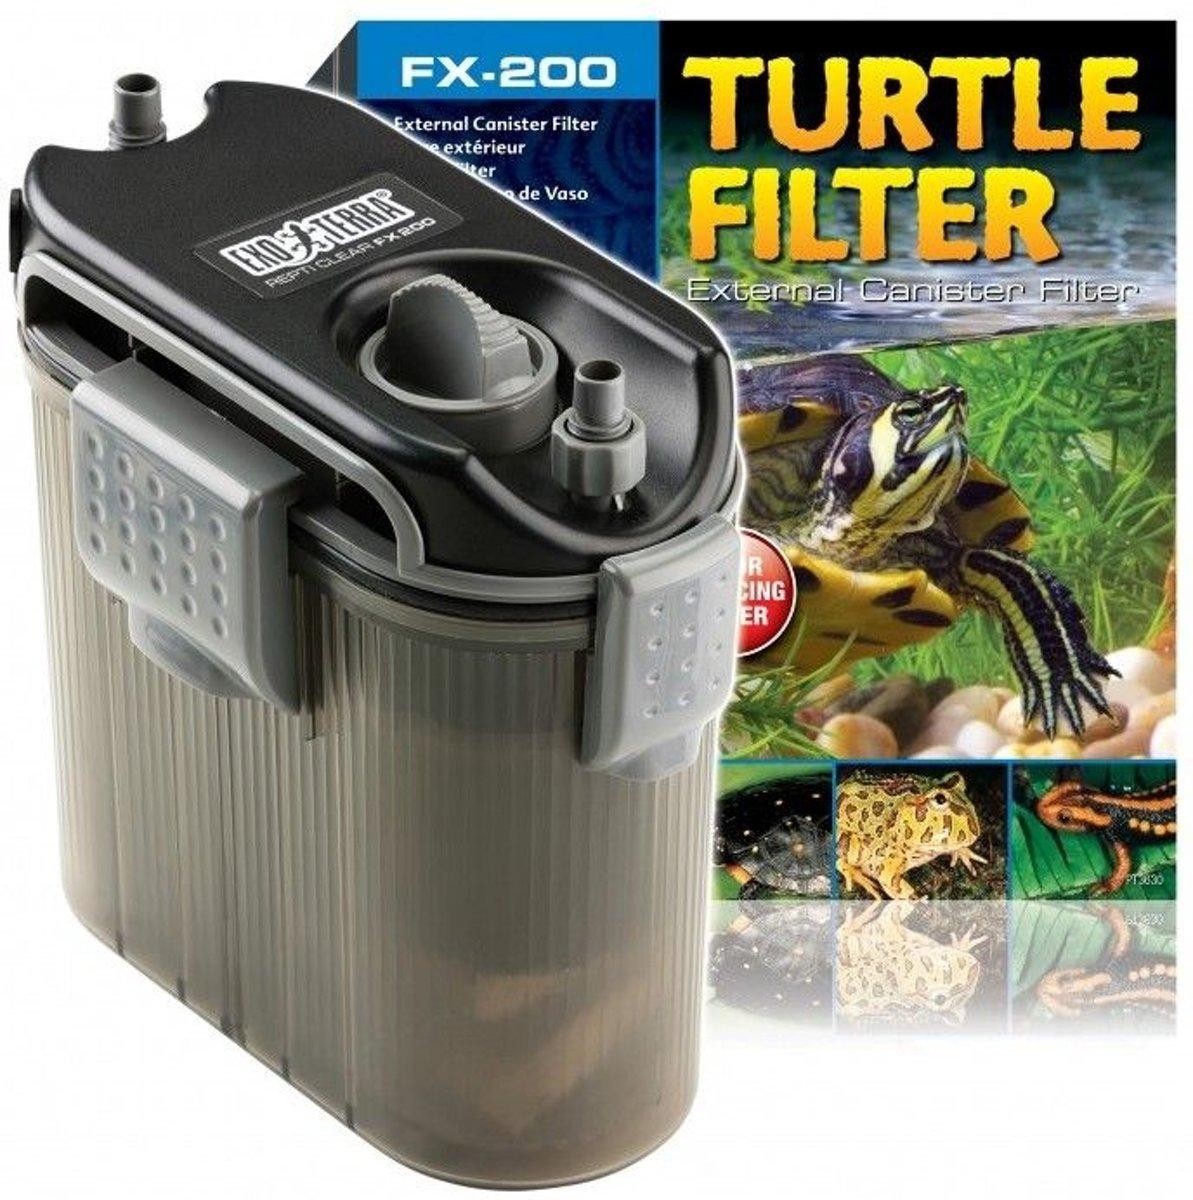 Turtle Filter FX-200